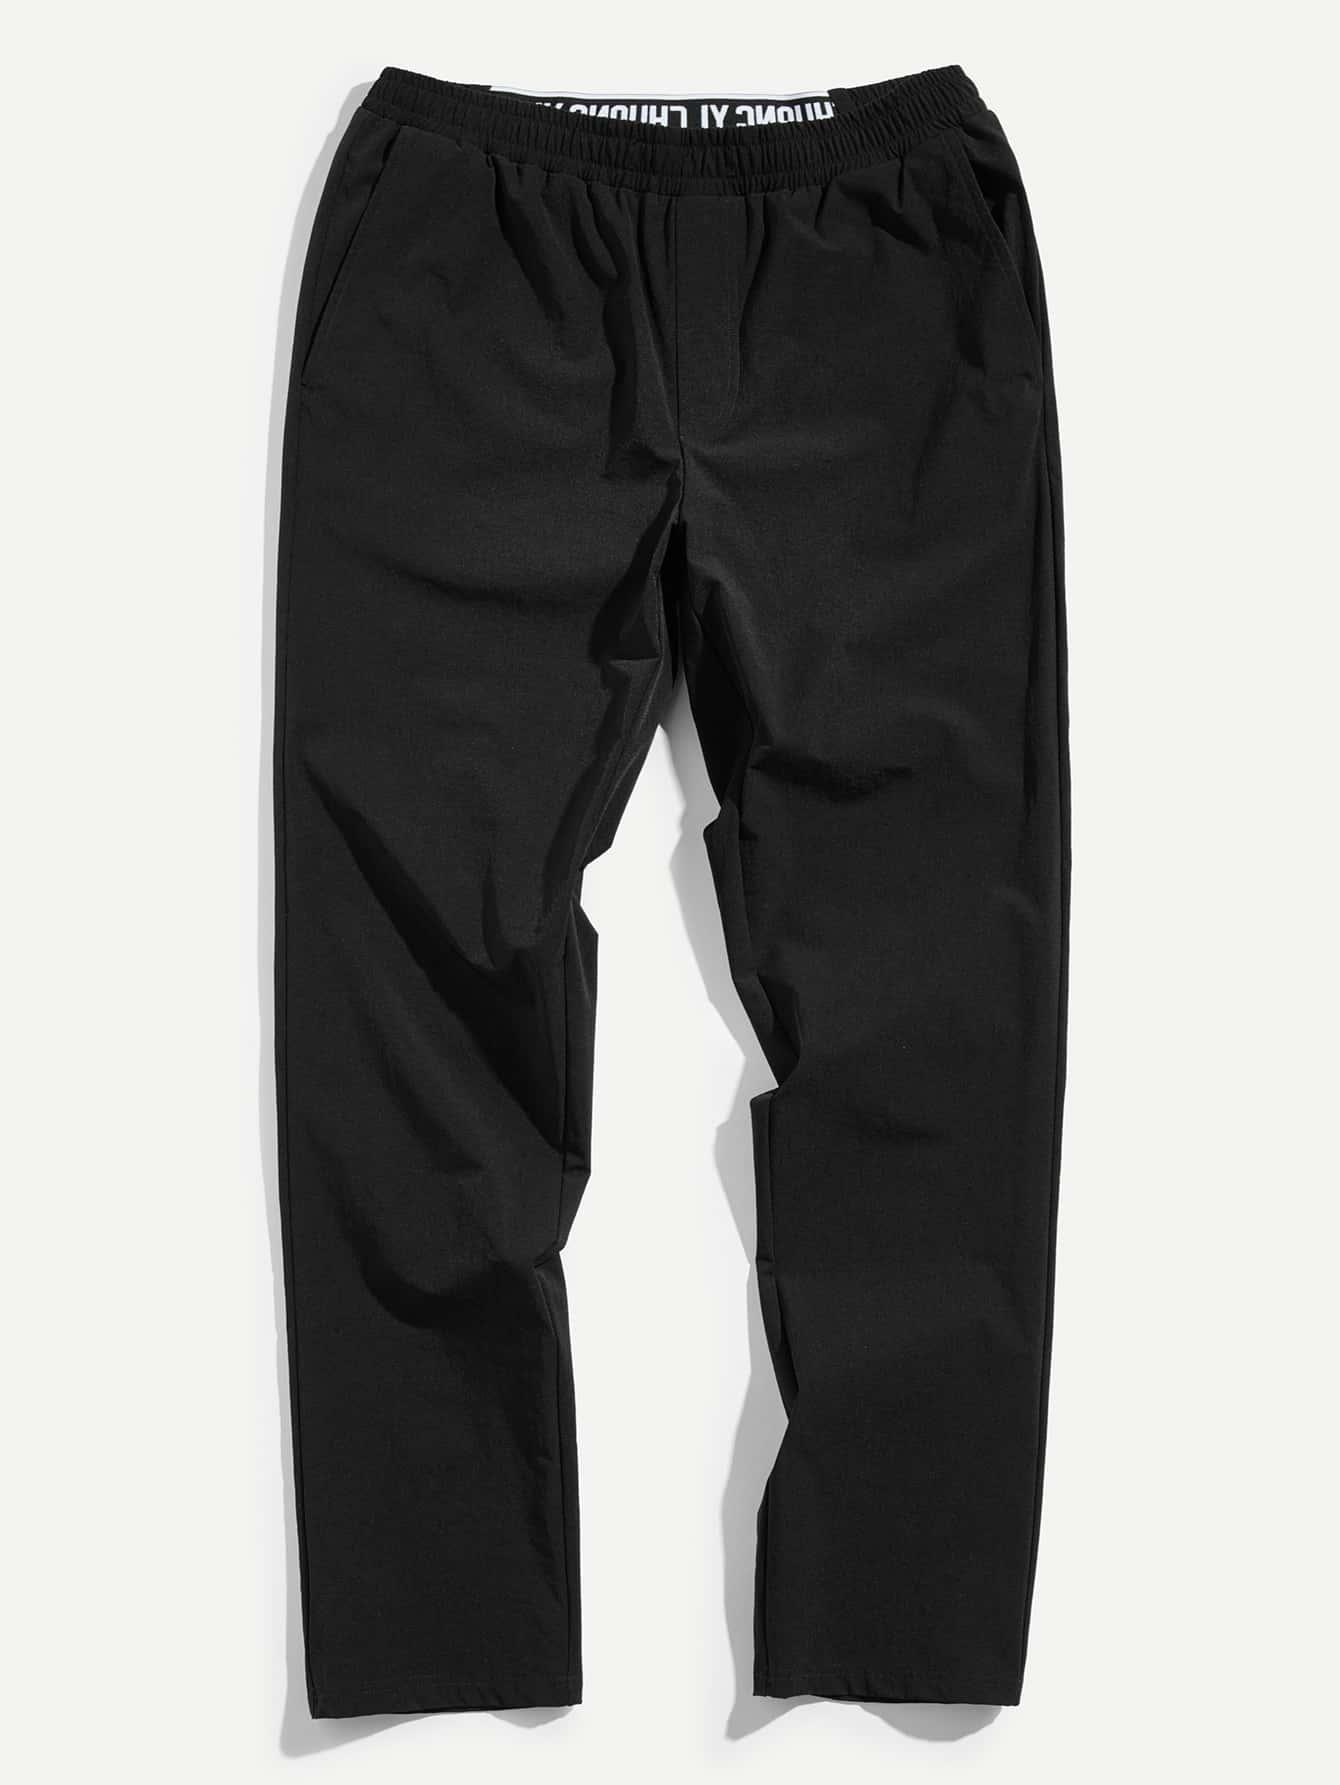 Мужчины Письмо Талия Slant Карманные брюки